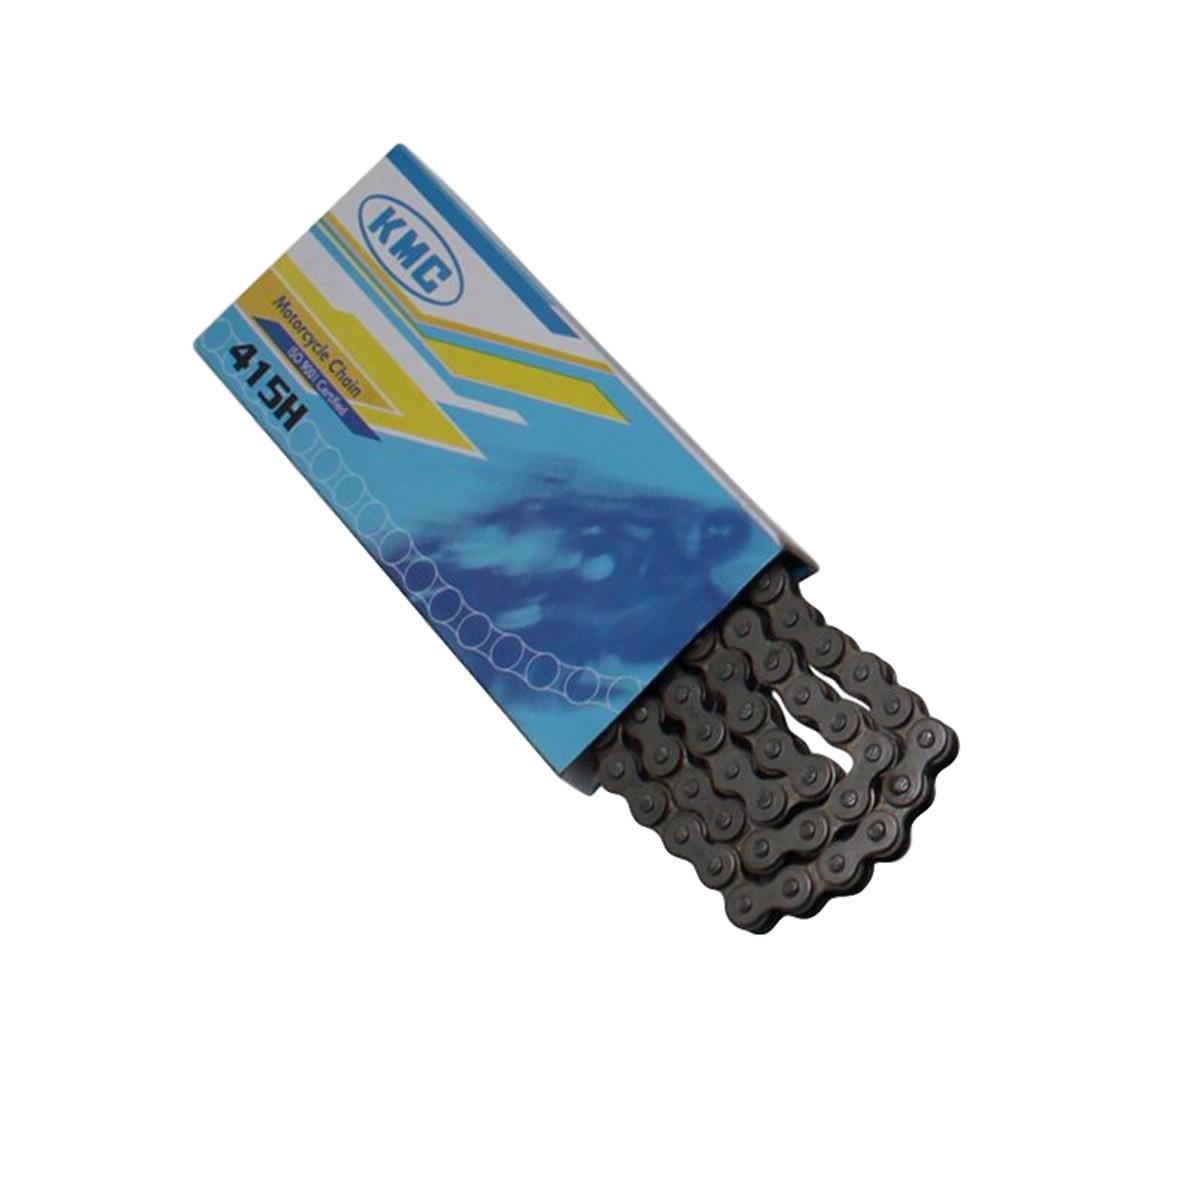 Chaîne 415 120 Maillons - KMC Standard